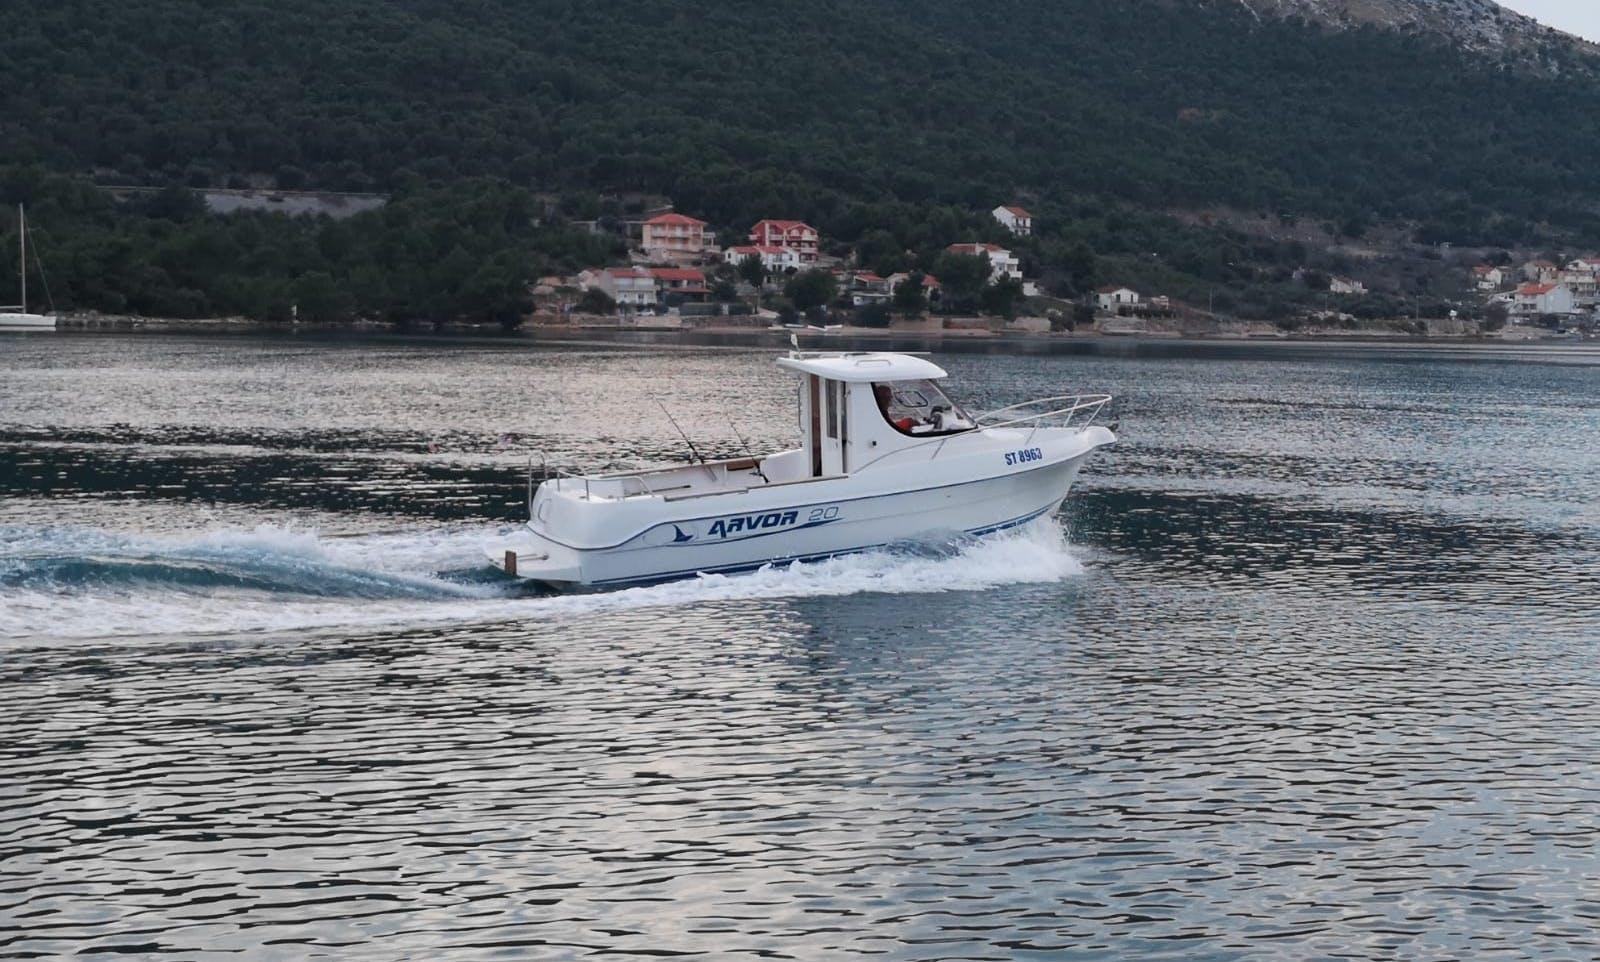 Aarvor 20 Cuddy Cabin Rental In Sibenik, Croatia